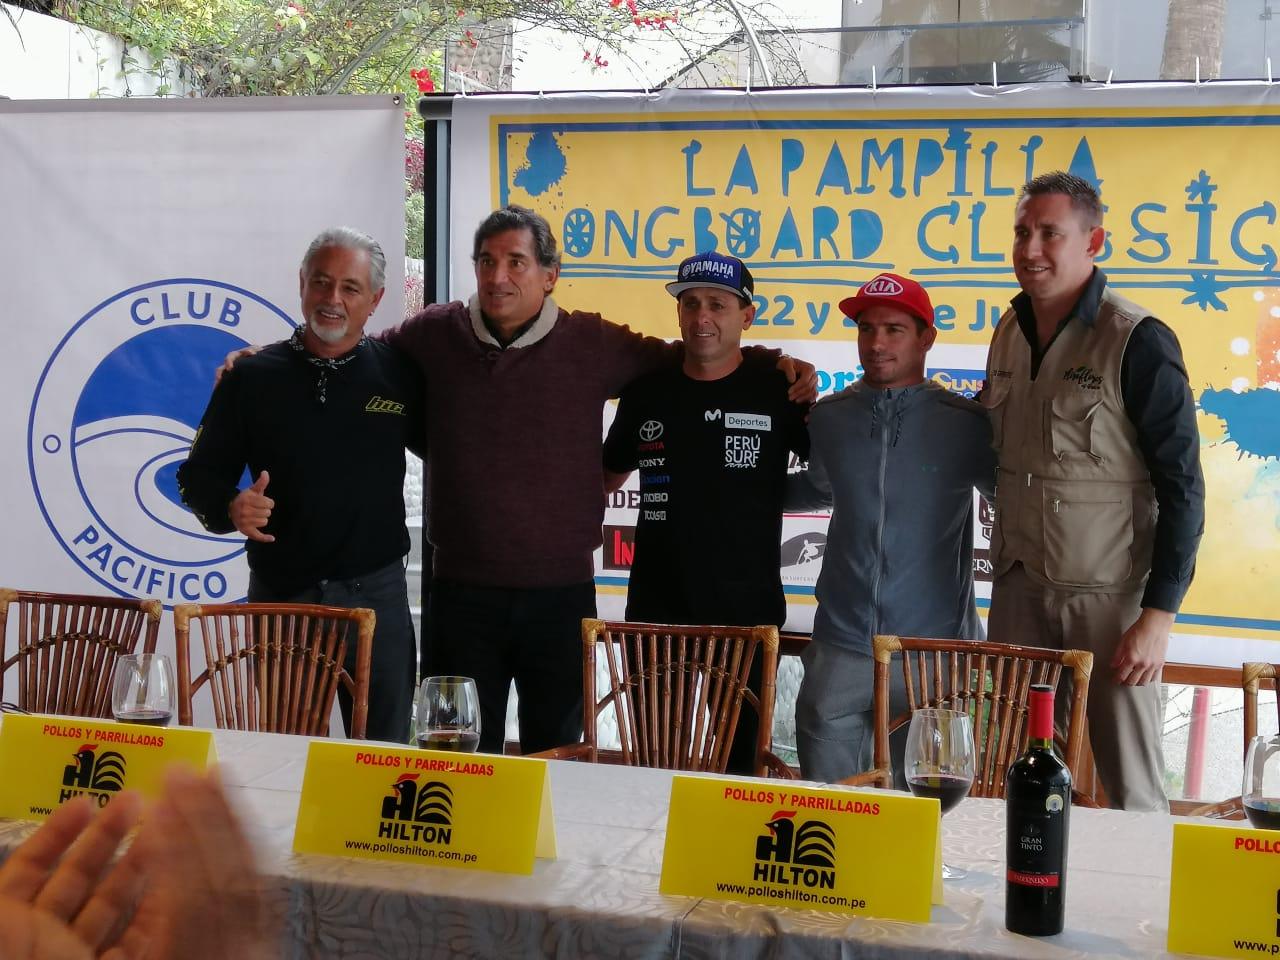 Campeonato La Pampilla Longboard Classic 2019 - 5ta edición